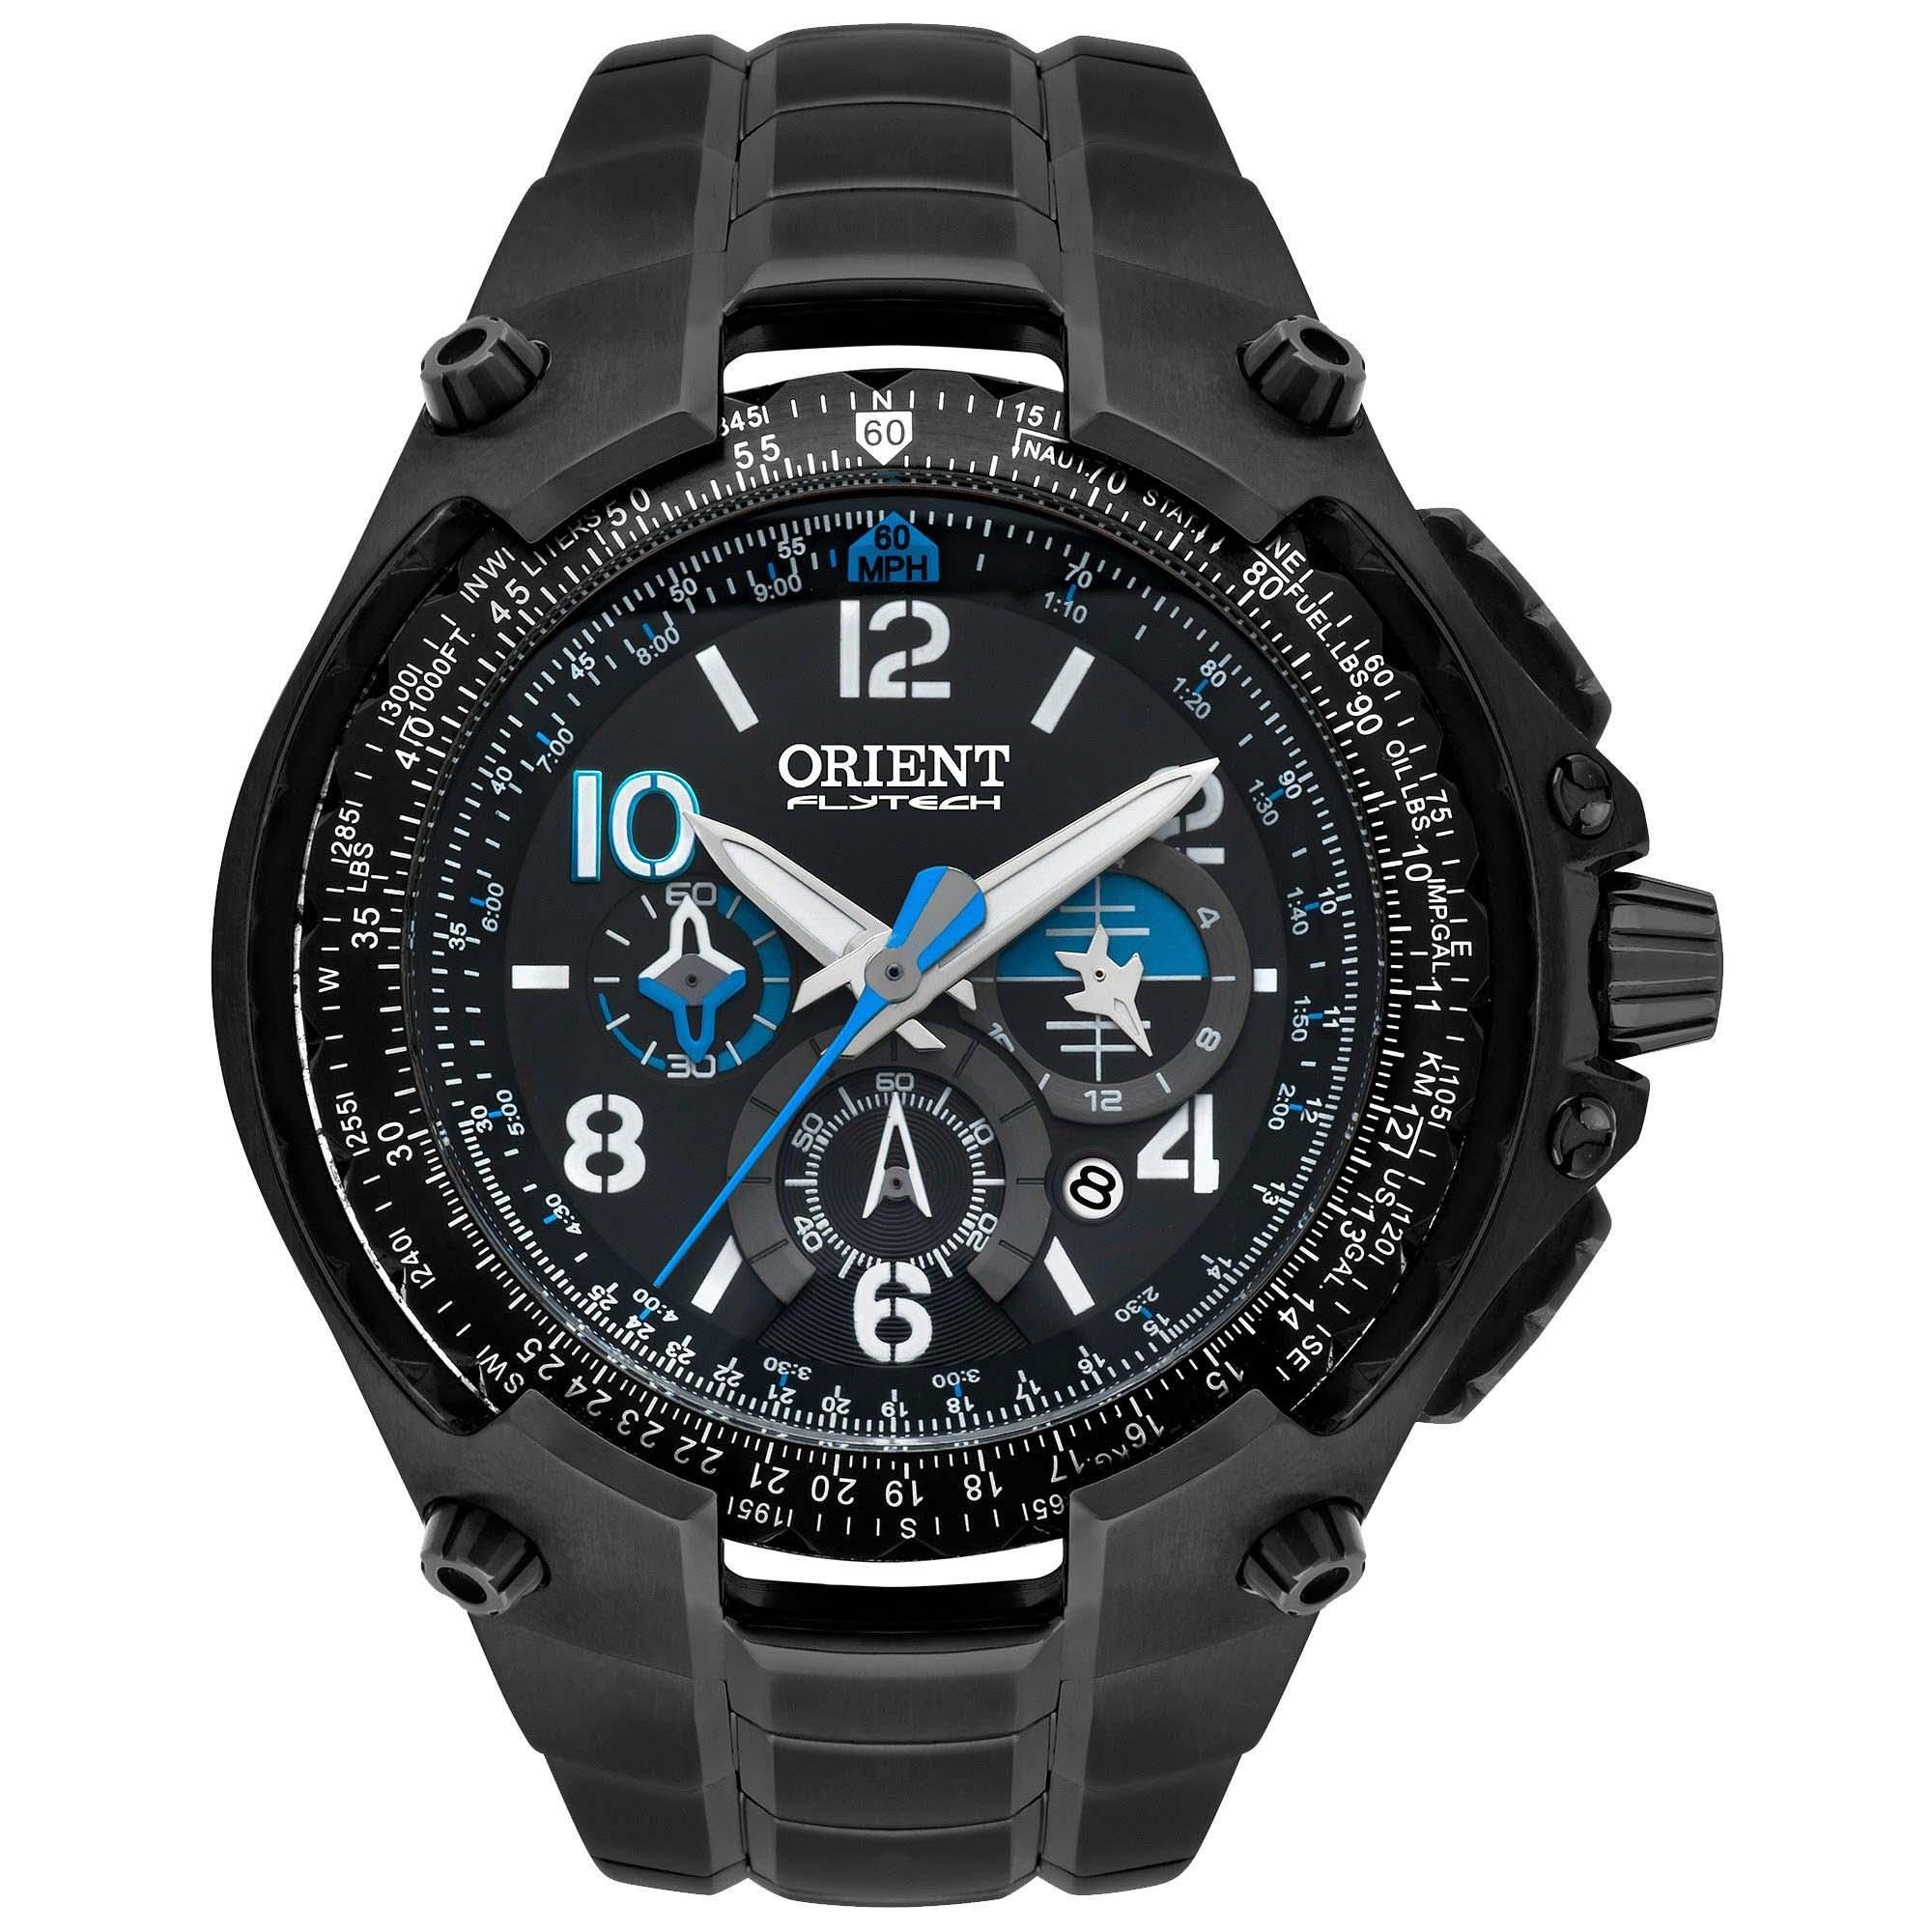 Relógio Masculino Orient MPTTC001 P2PX Edição Limitada 930/1028